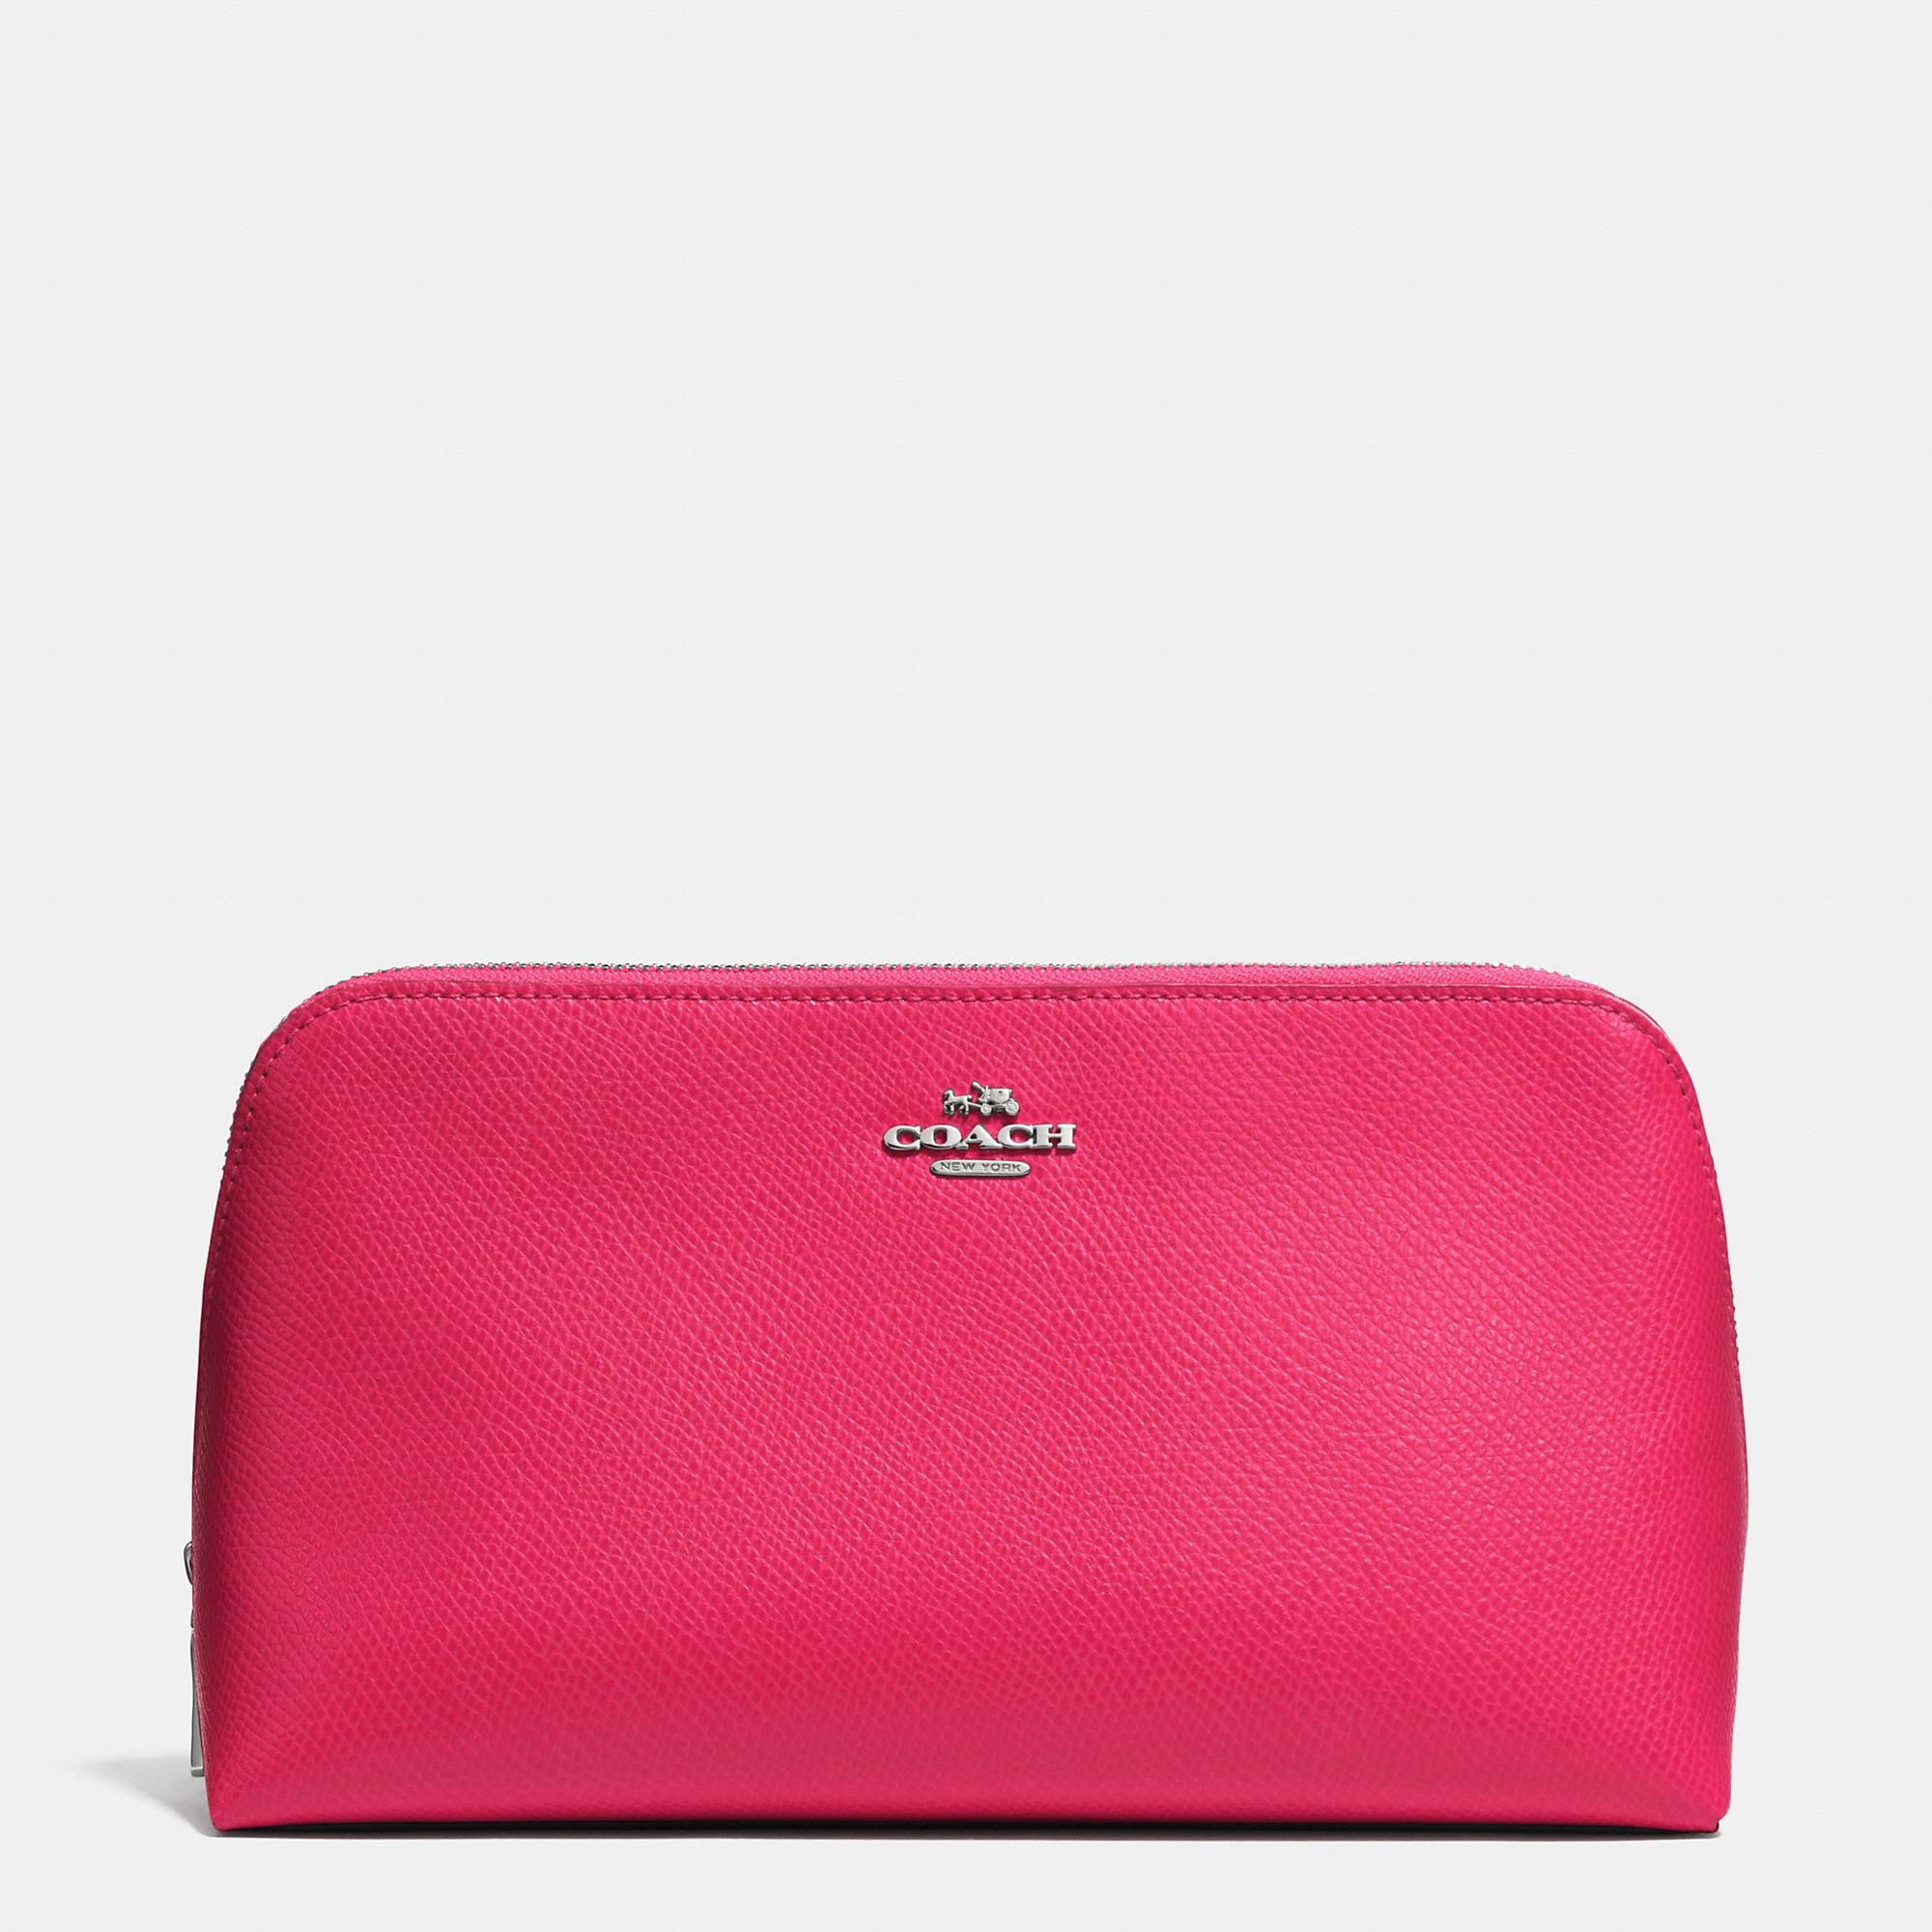 Coach Cosmetic Case 22 In Crossgrain Leather